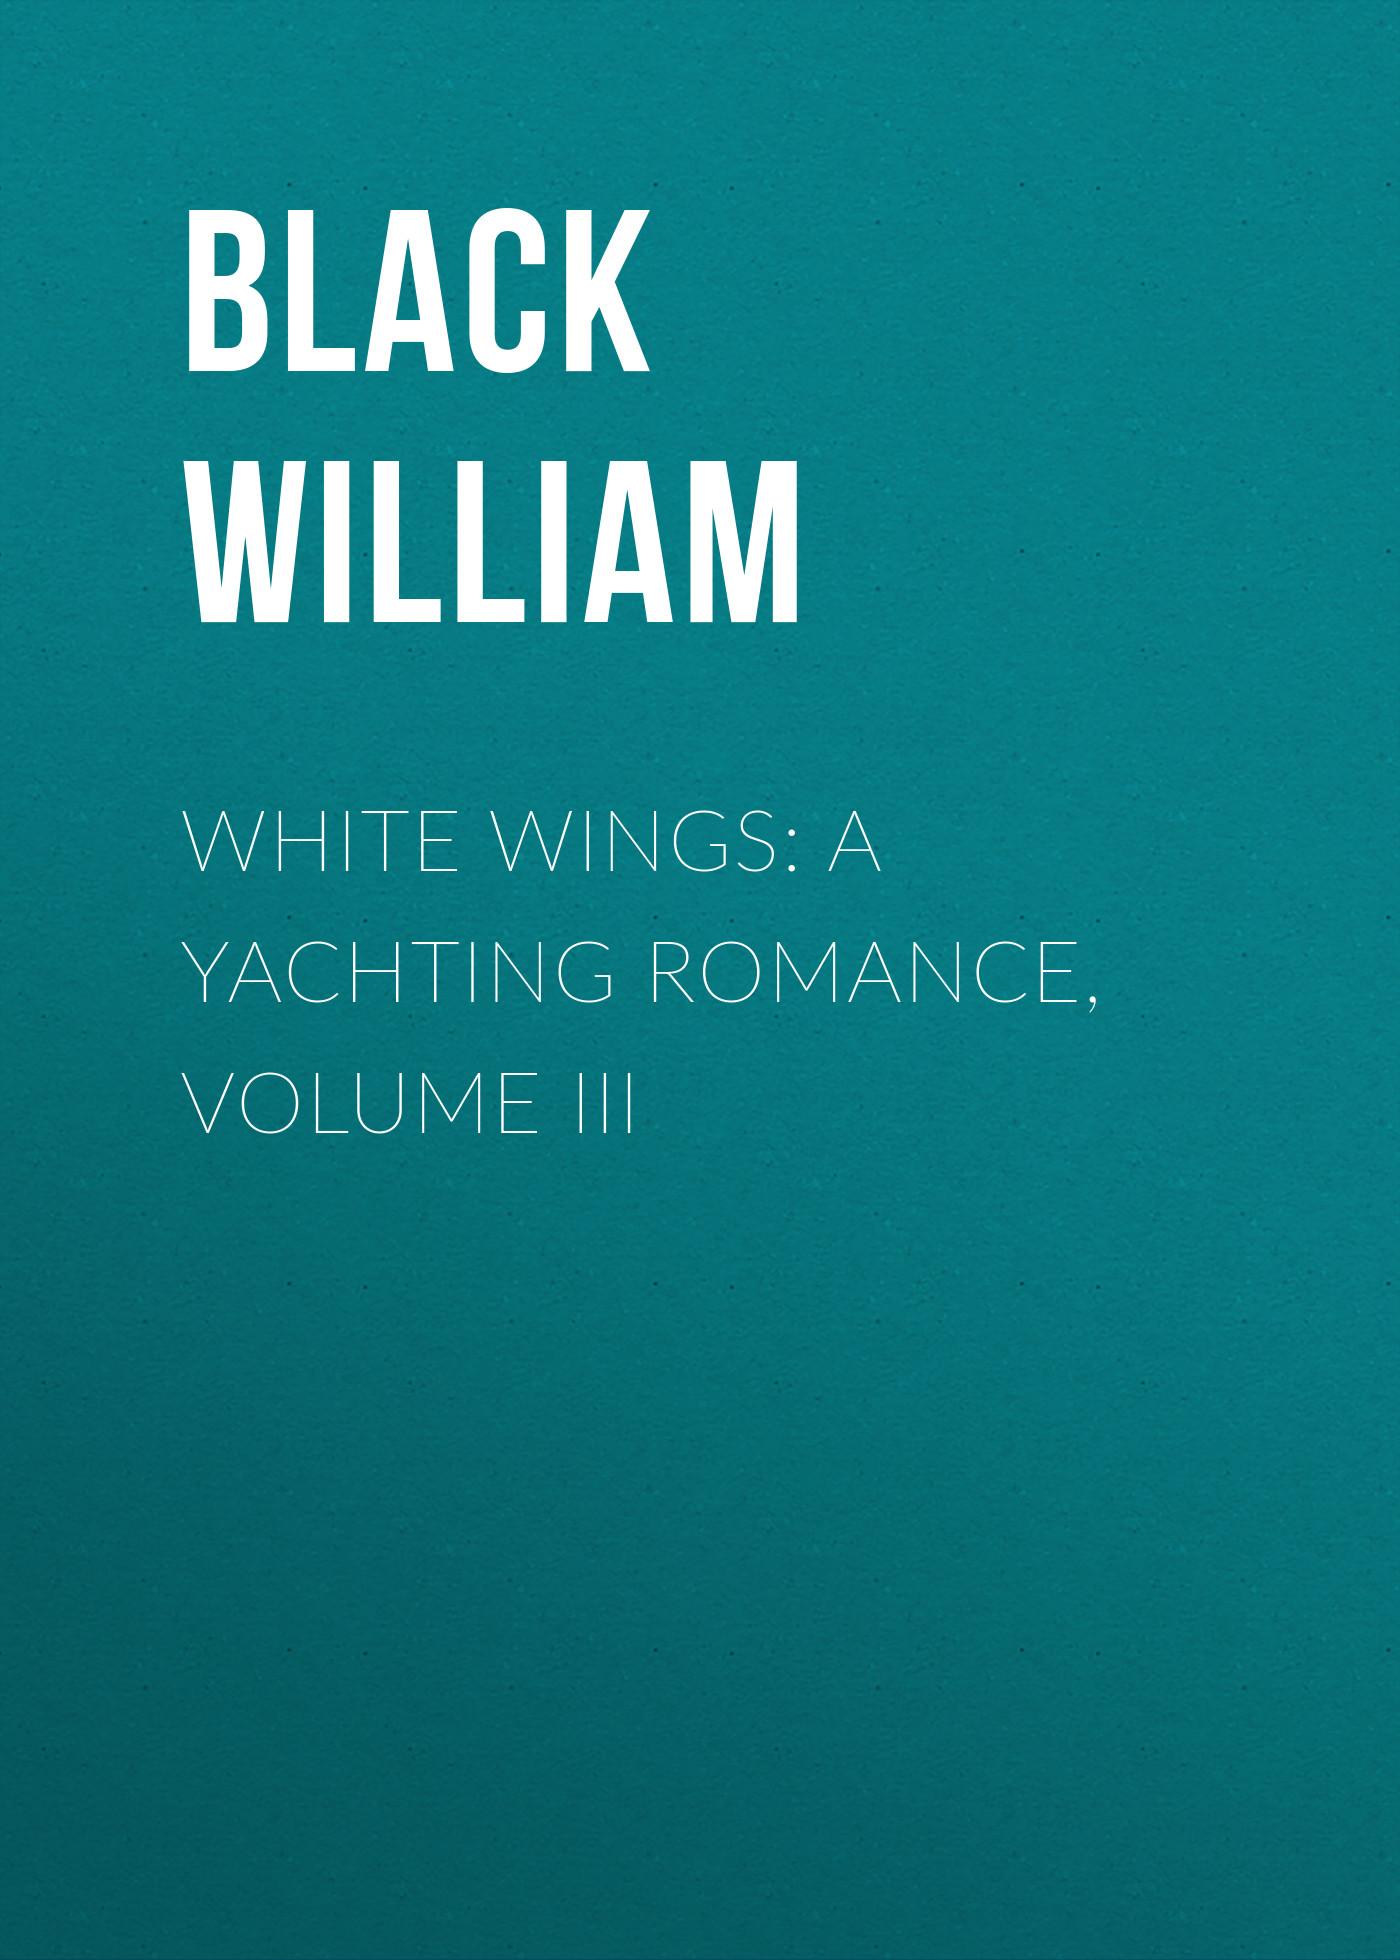 лучшая цена Black William White Wings: A Yachting Romance, Volume III